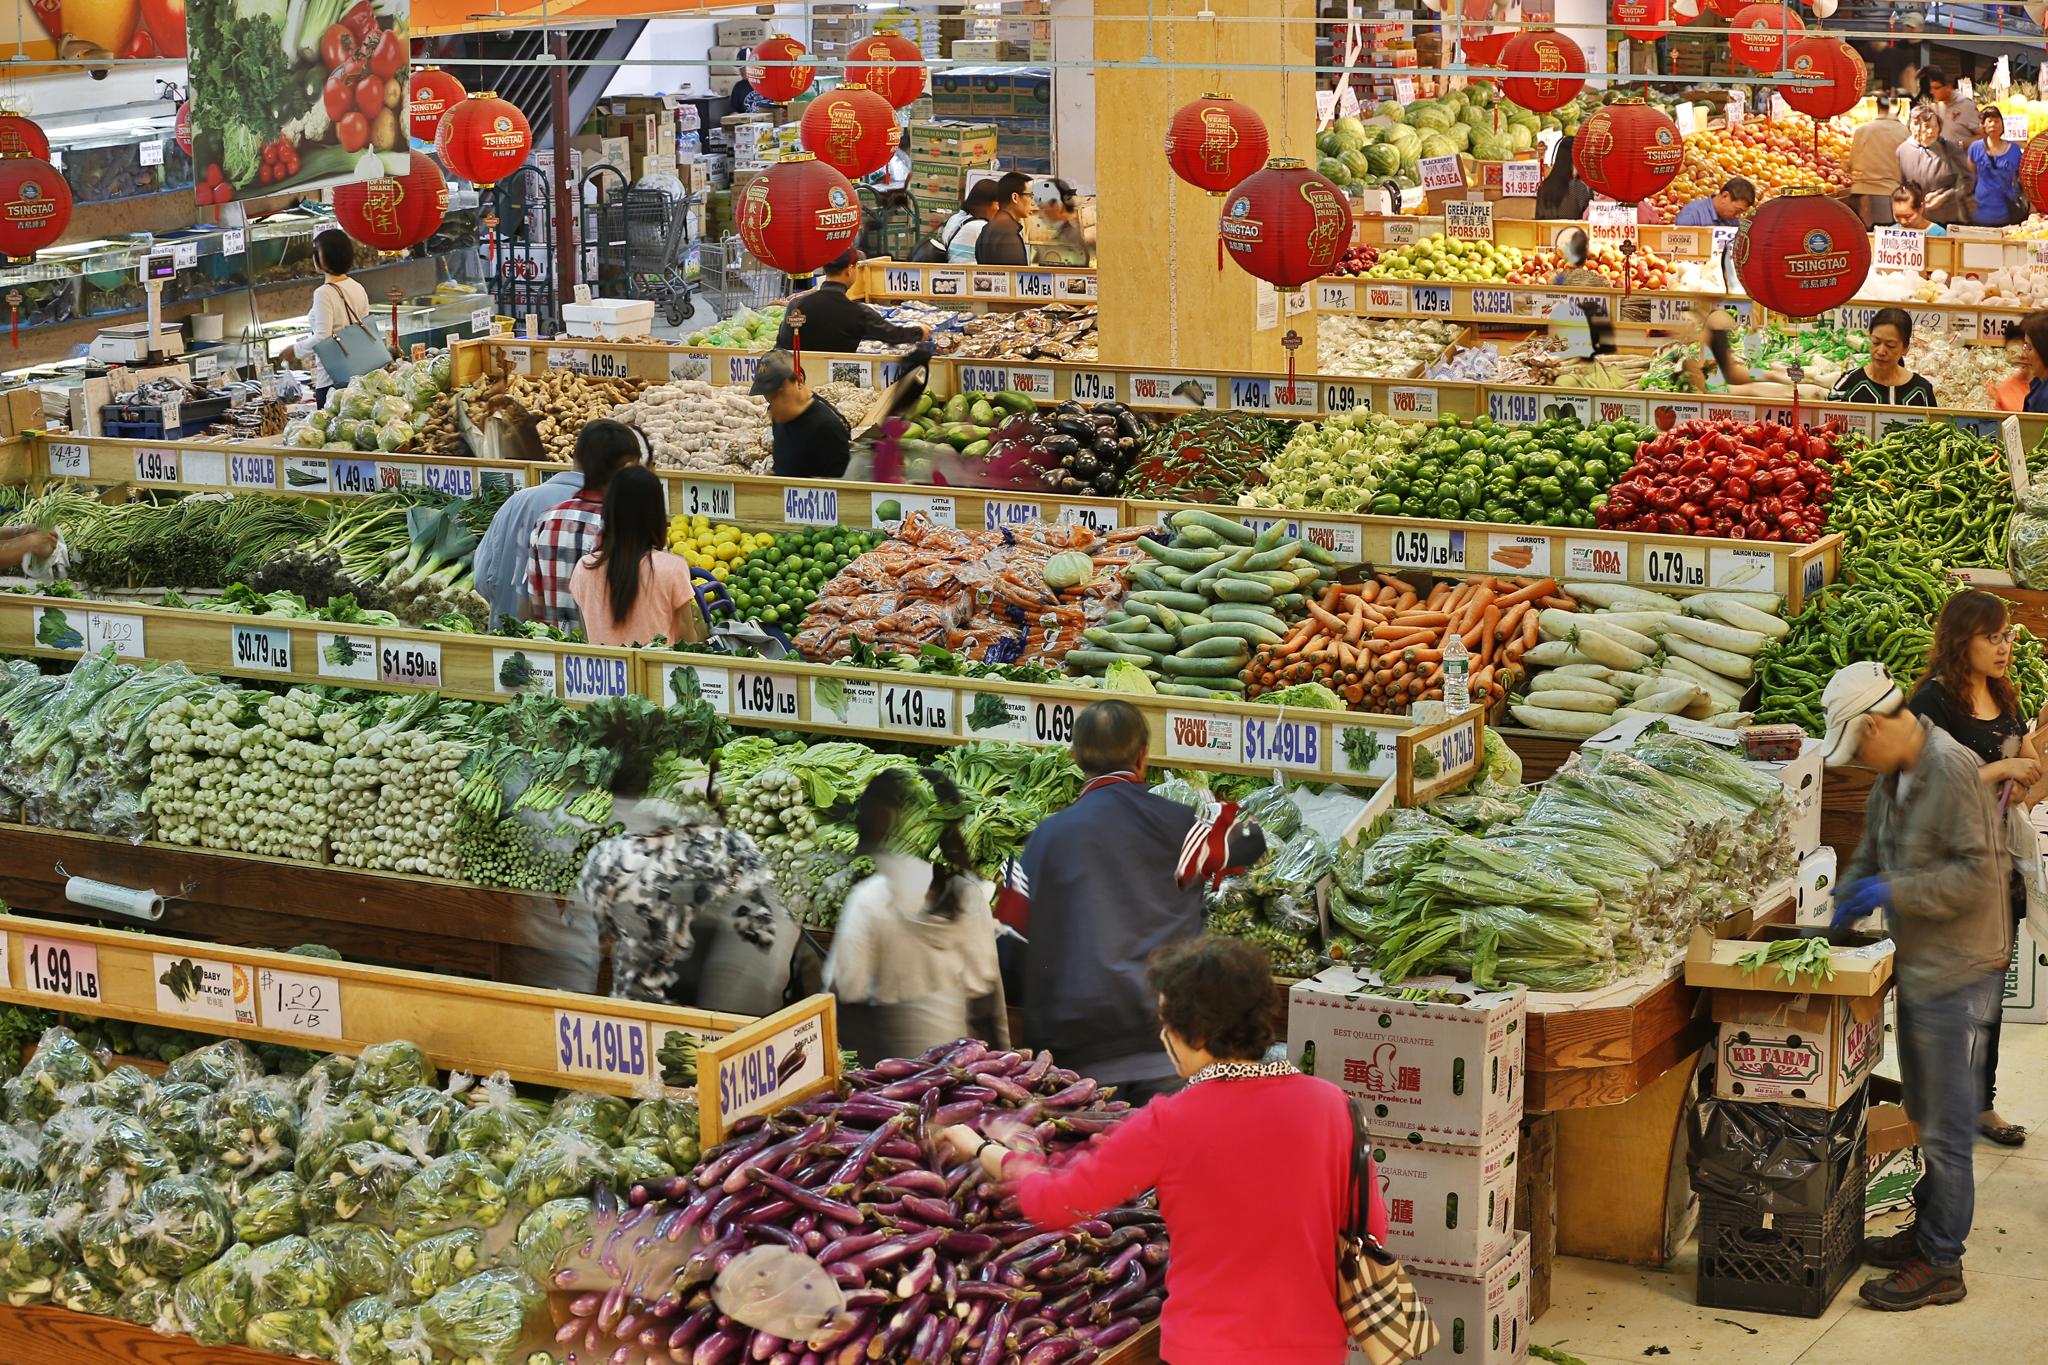 Market: Jmart